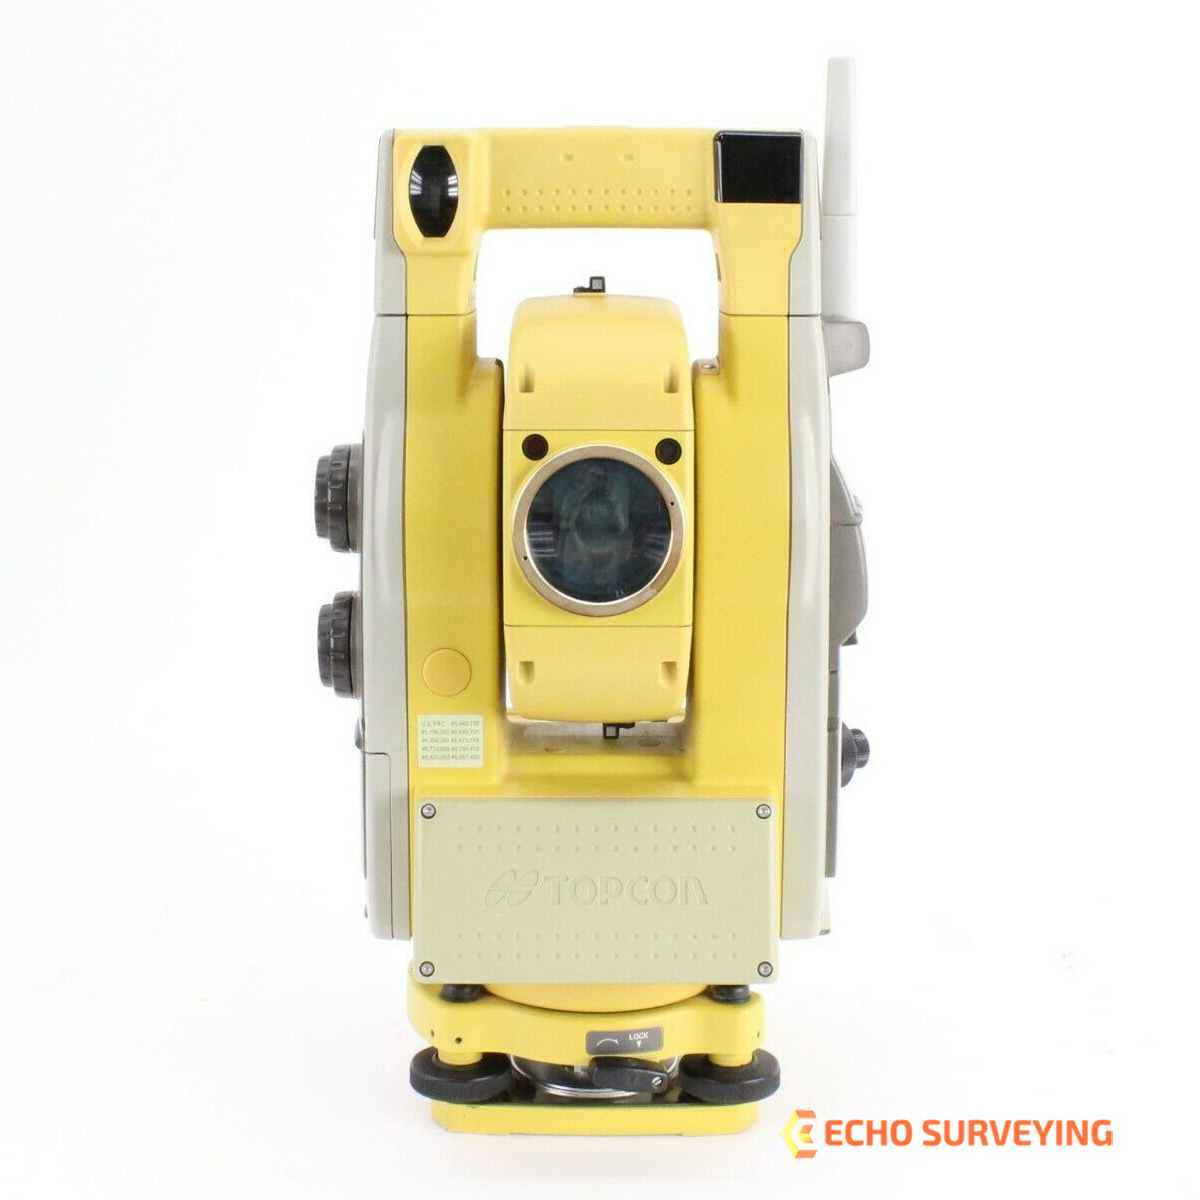 Topcon-GPT-9005A-price.jpg